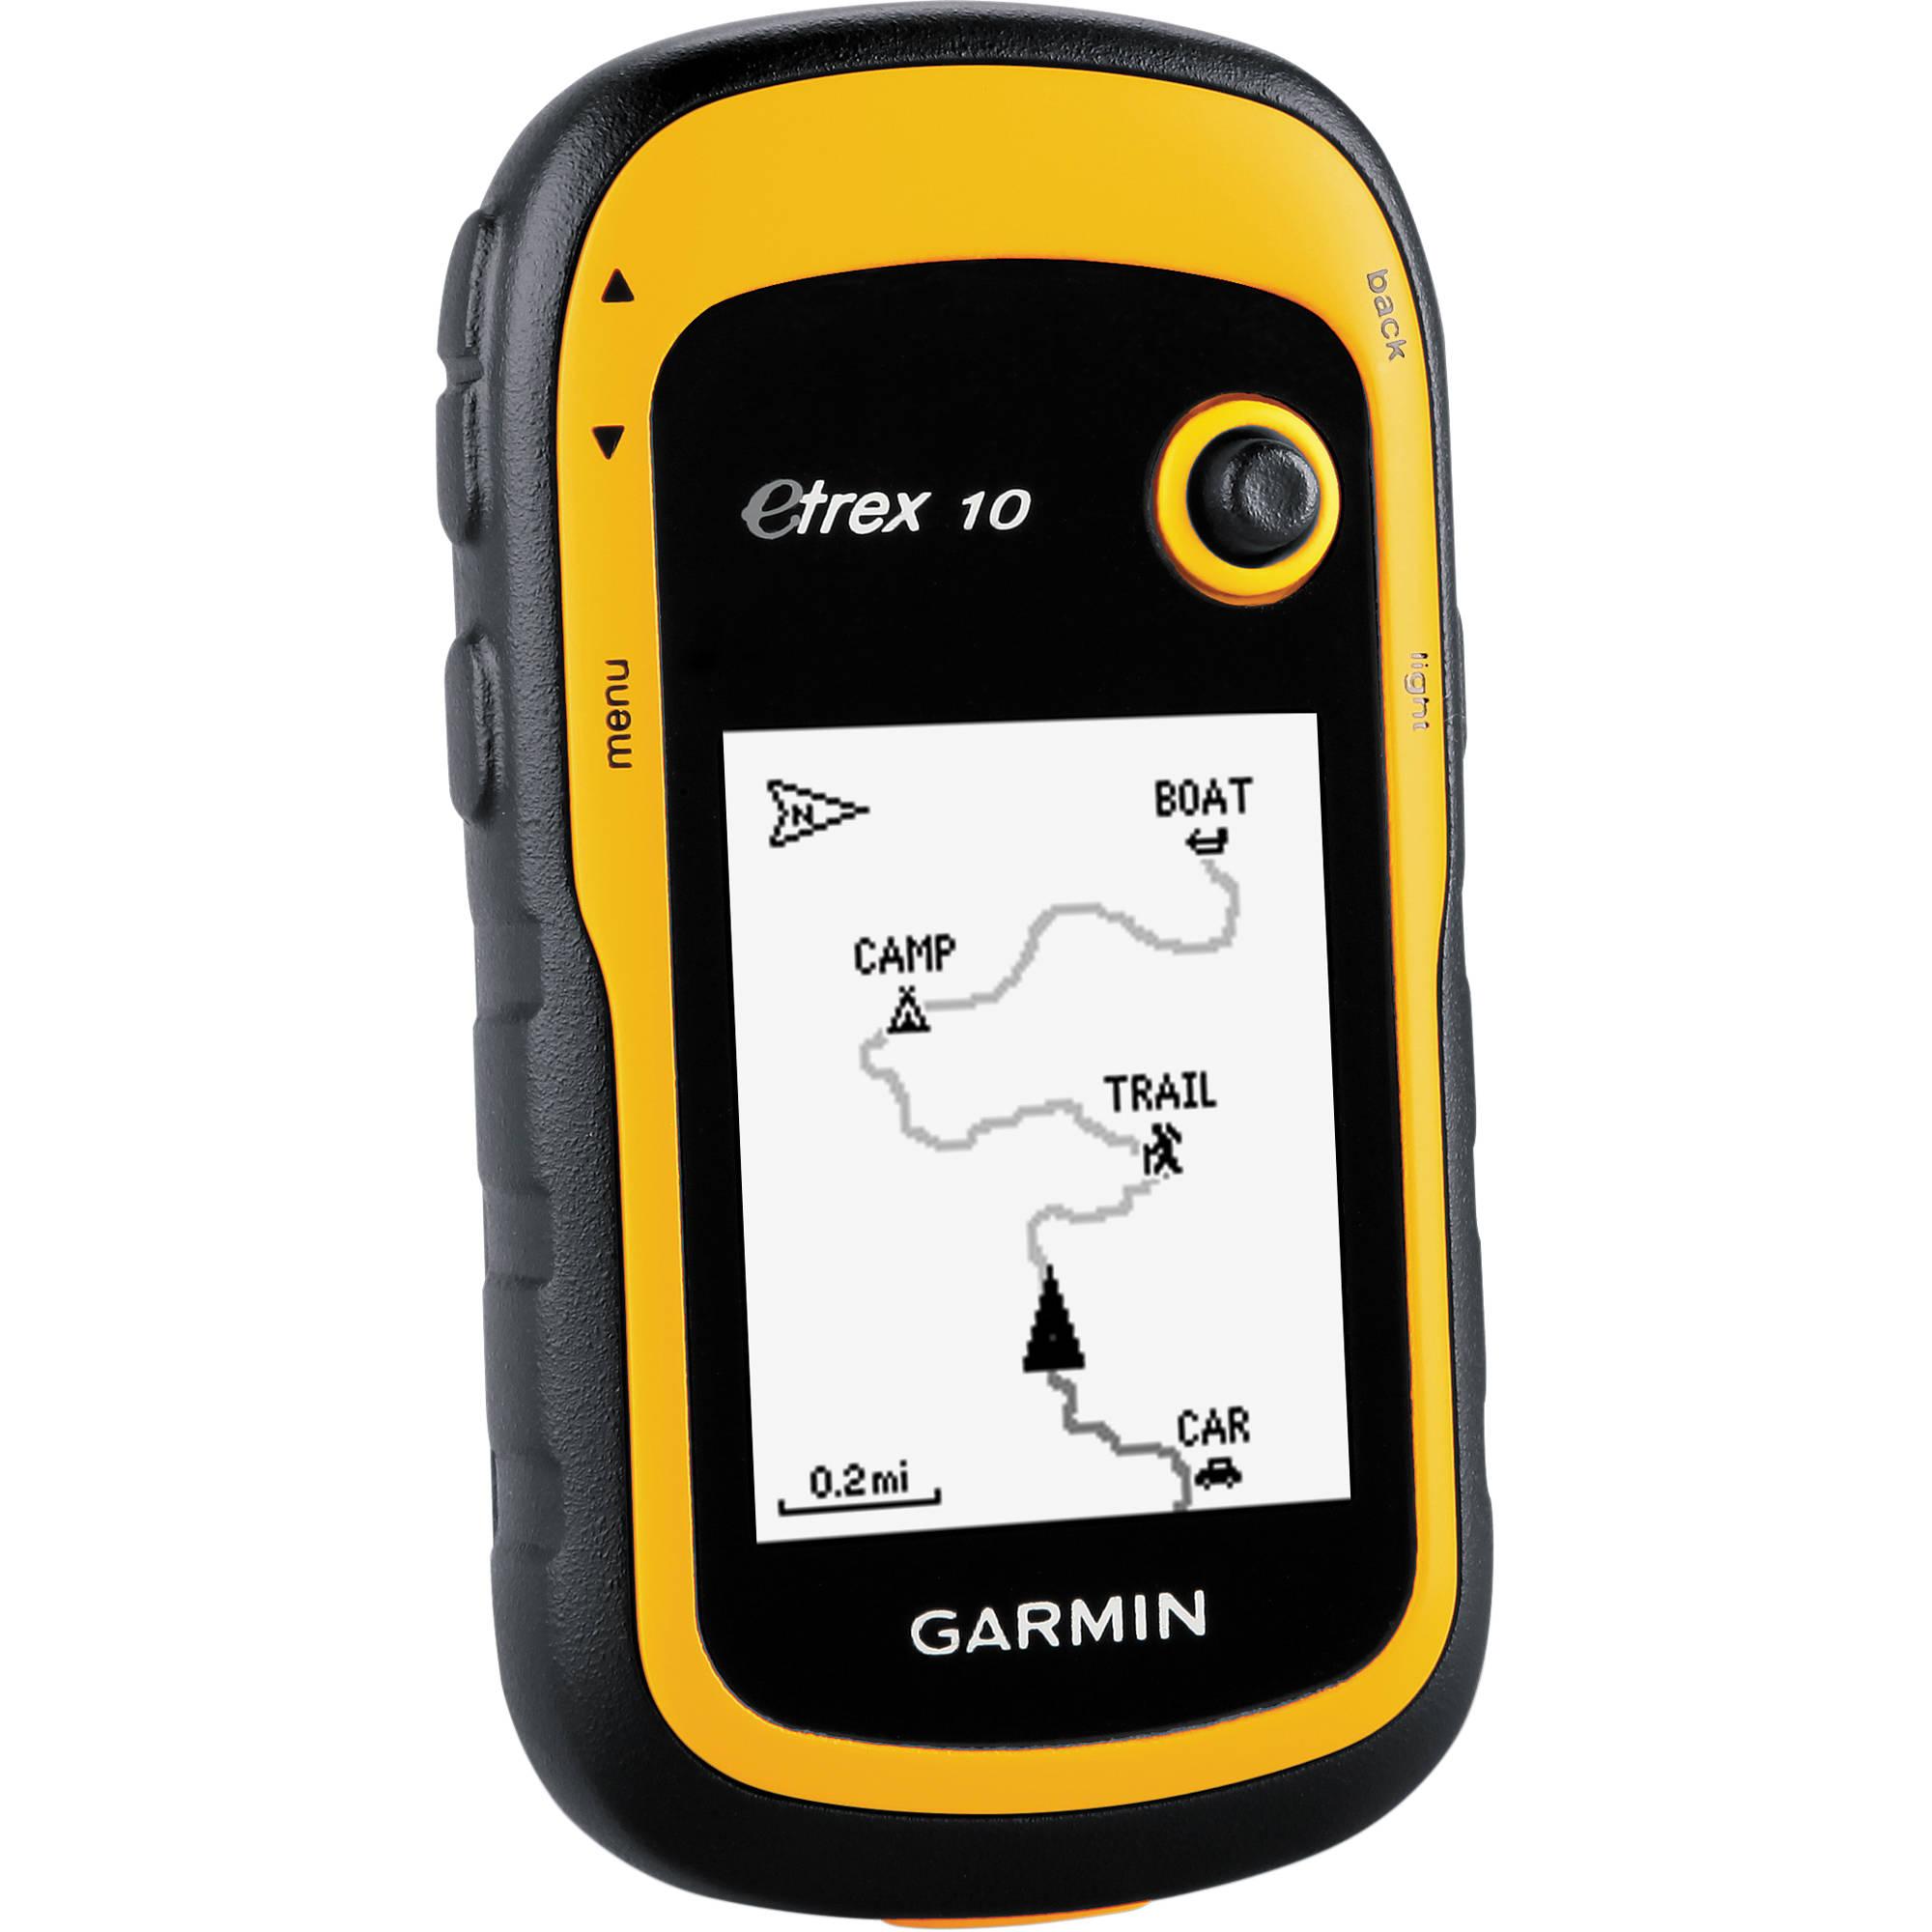 ≡ туристический gps-навигатор garmin etrex 10 (010-00970-01.